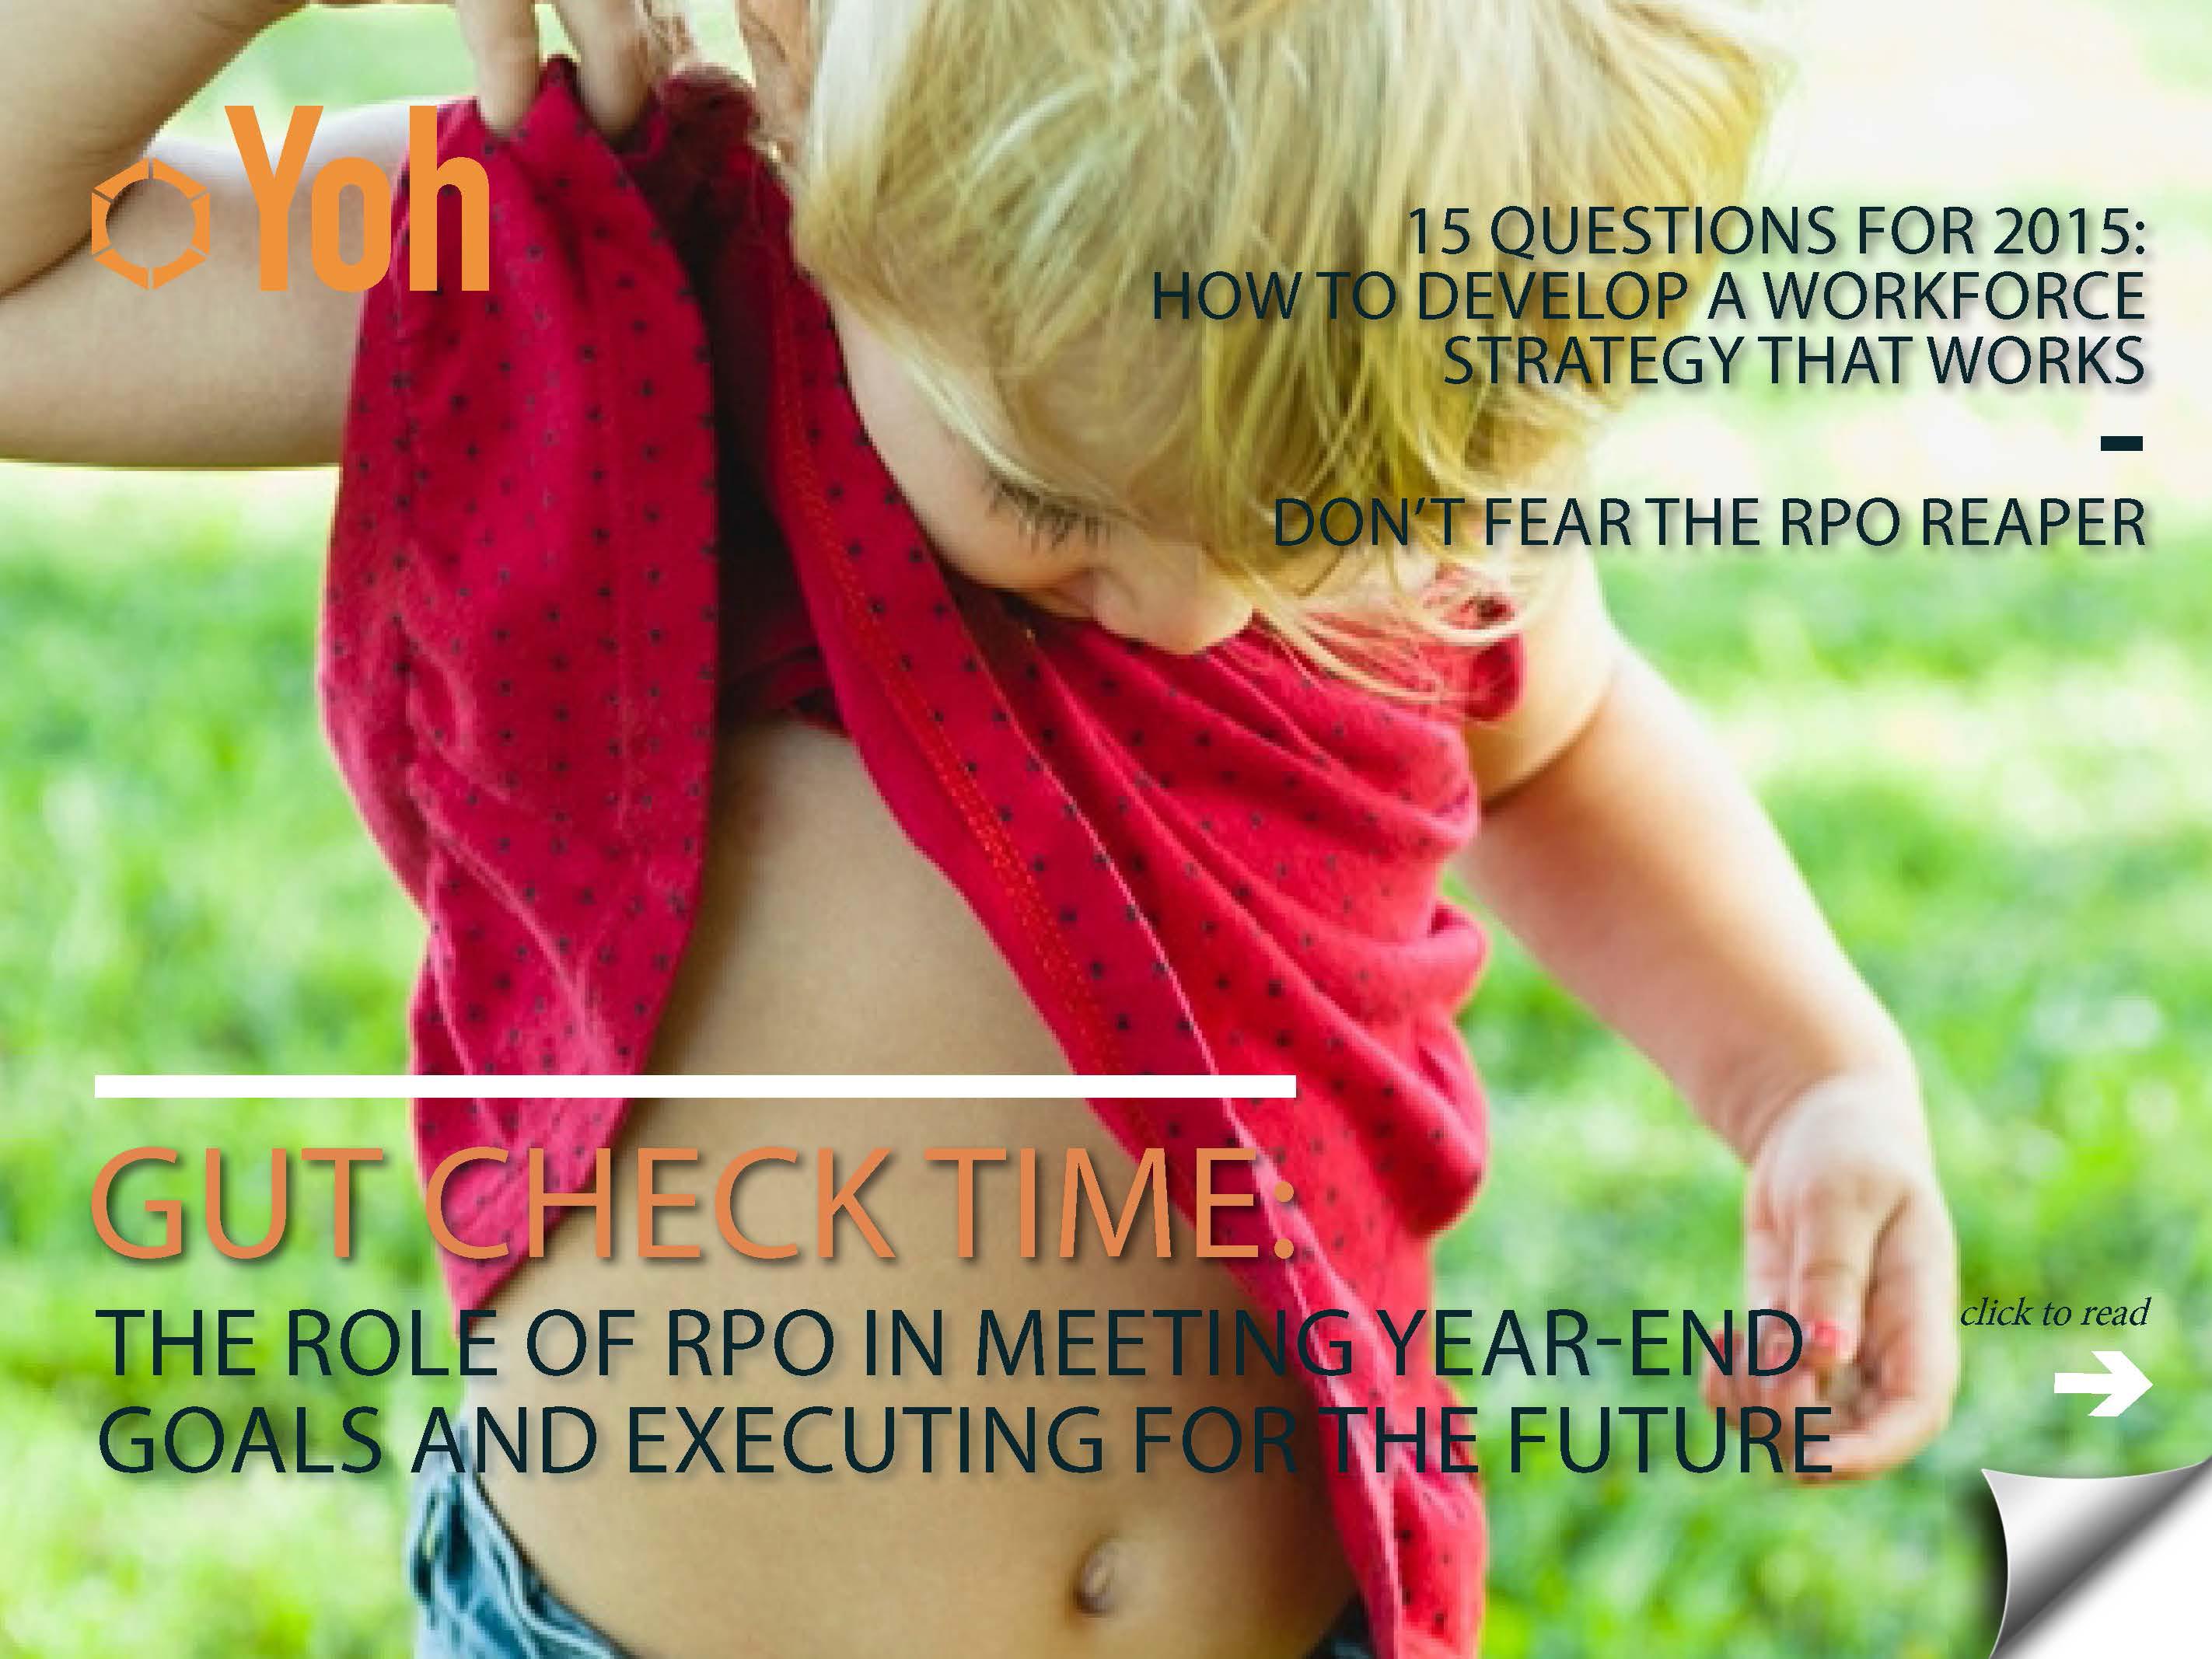 YOH_Magazine_October14_cover.jpg